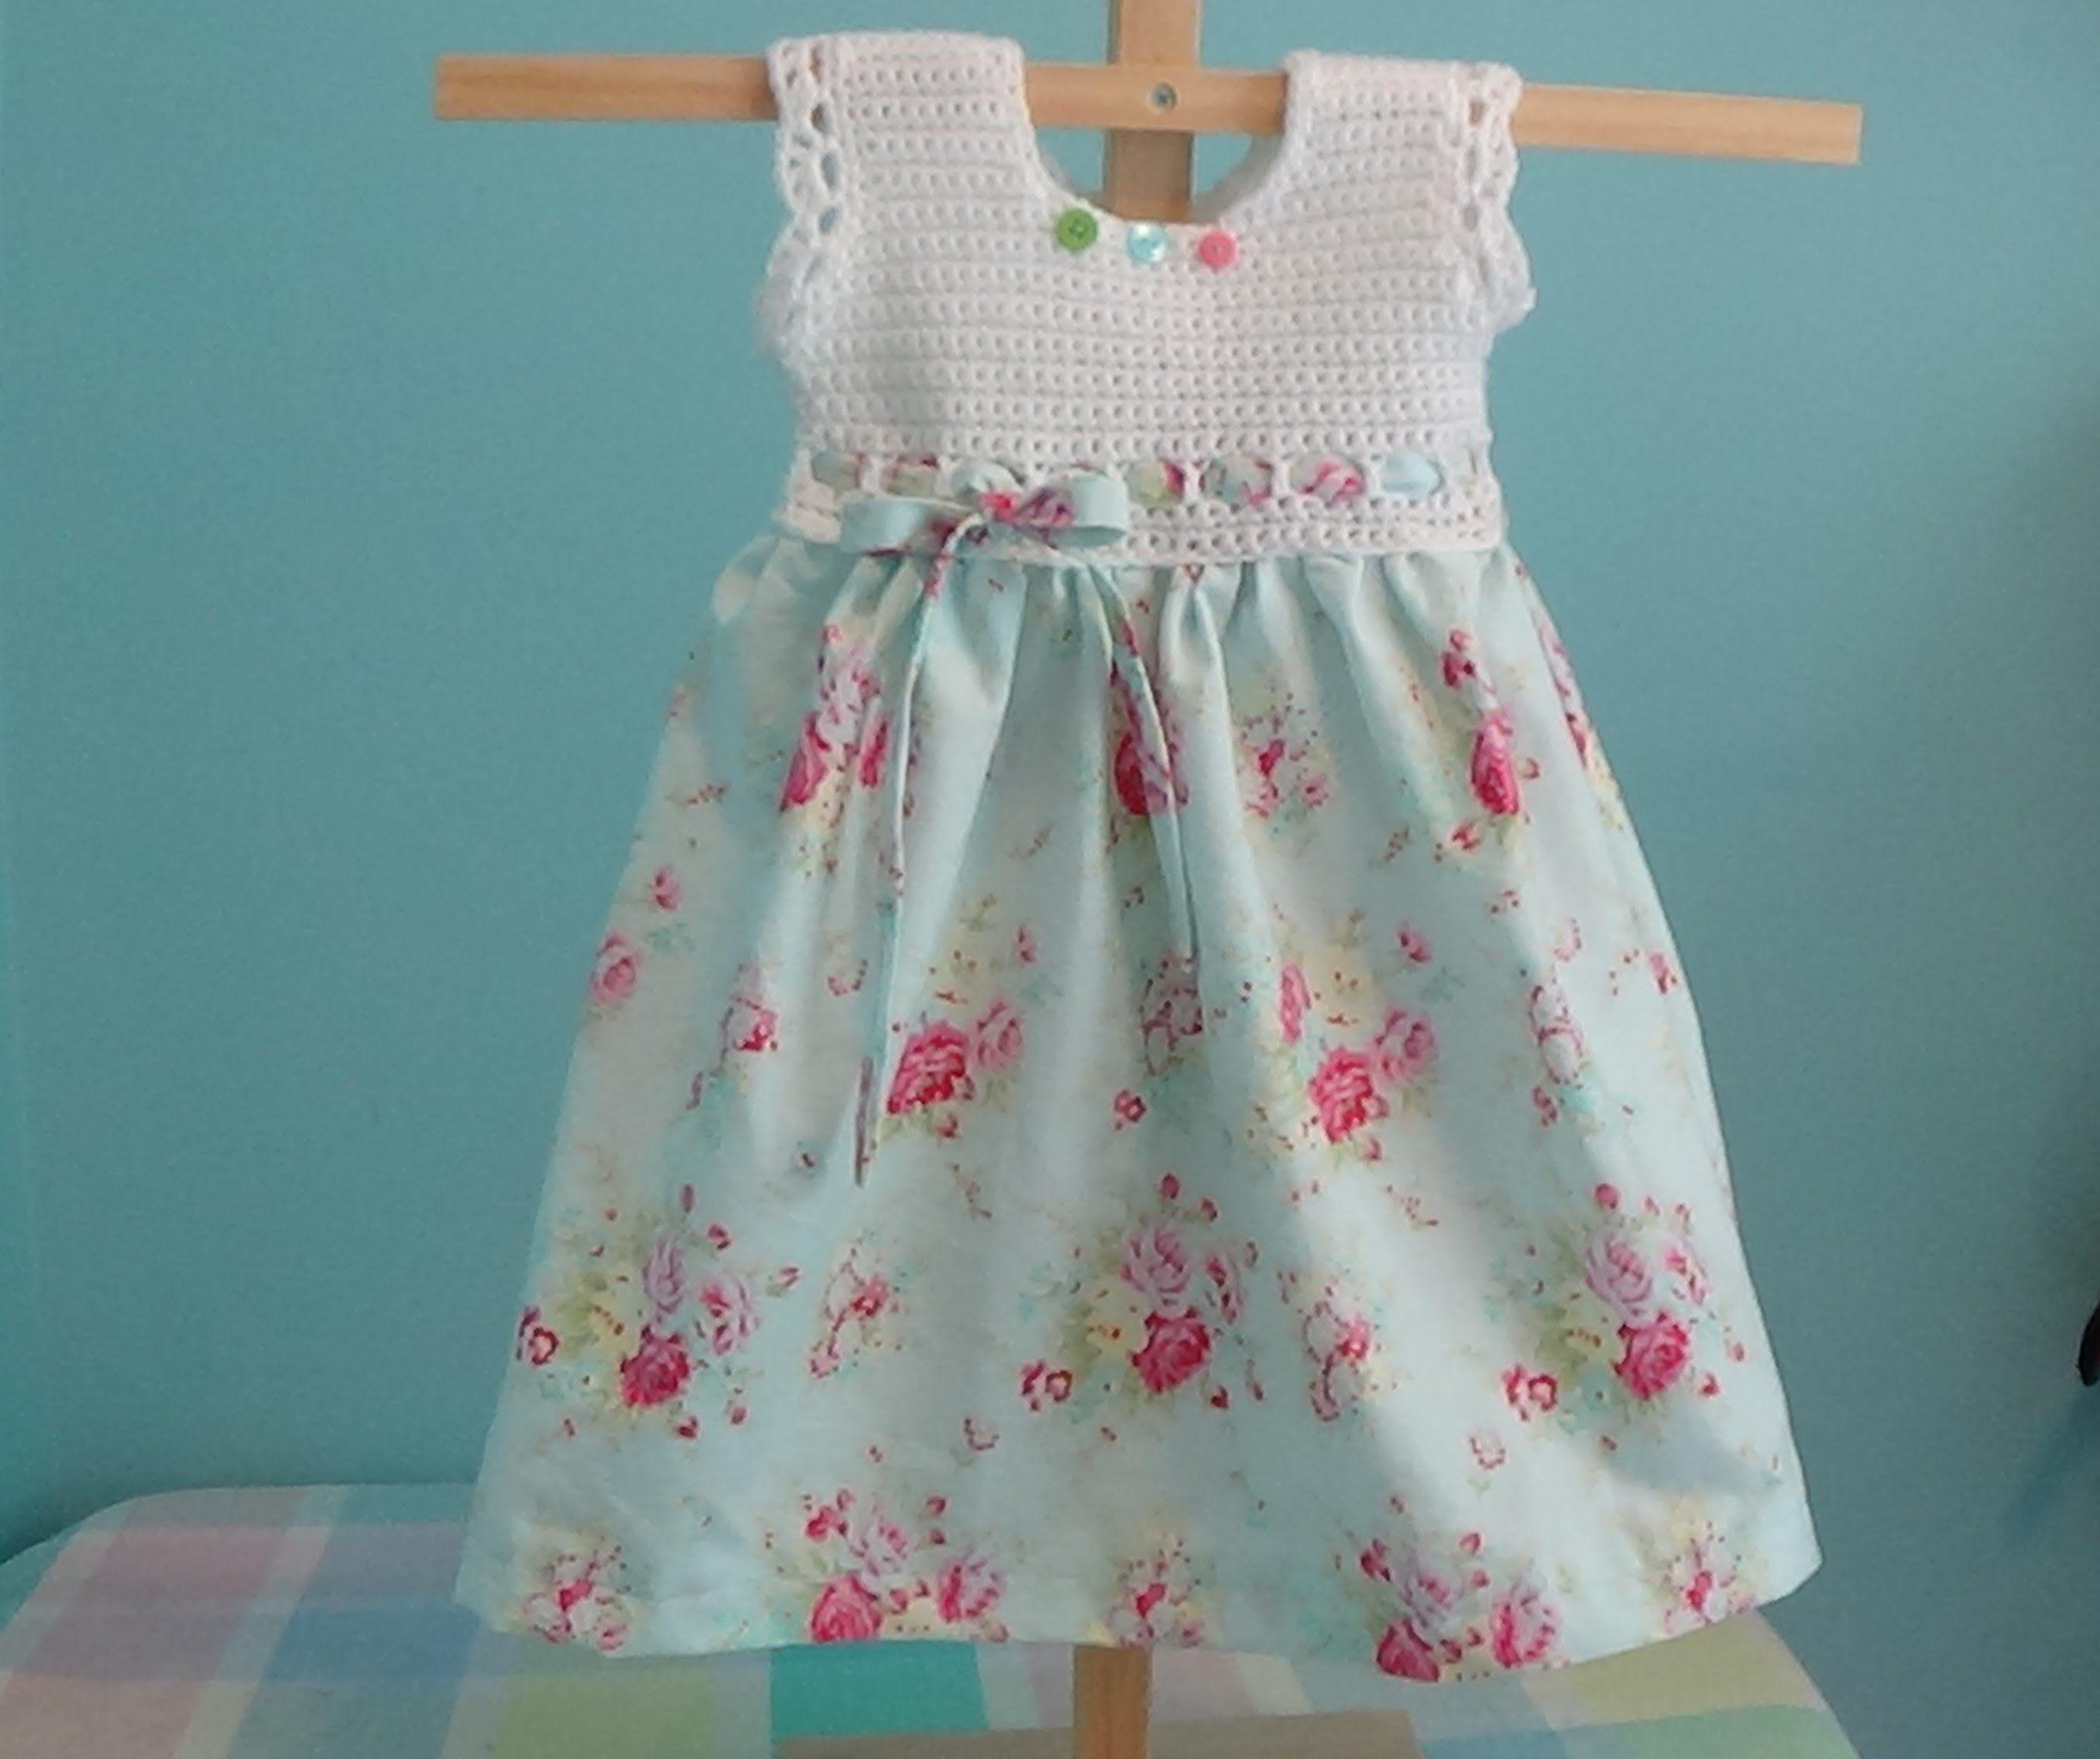 10+ Free Crochet and Fabric Dress Patterns | Kind mode, Häckeln und ...